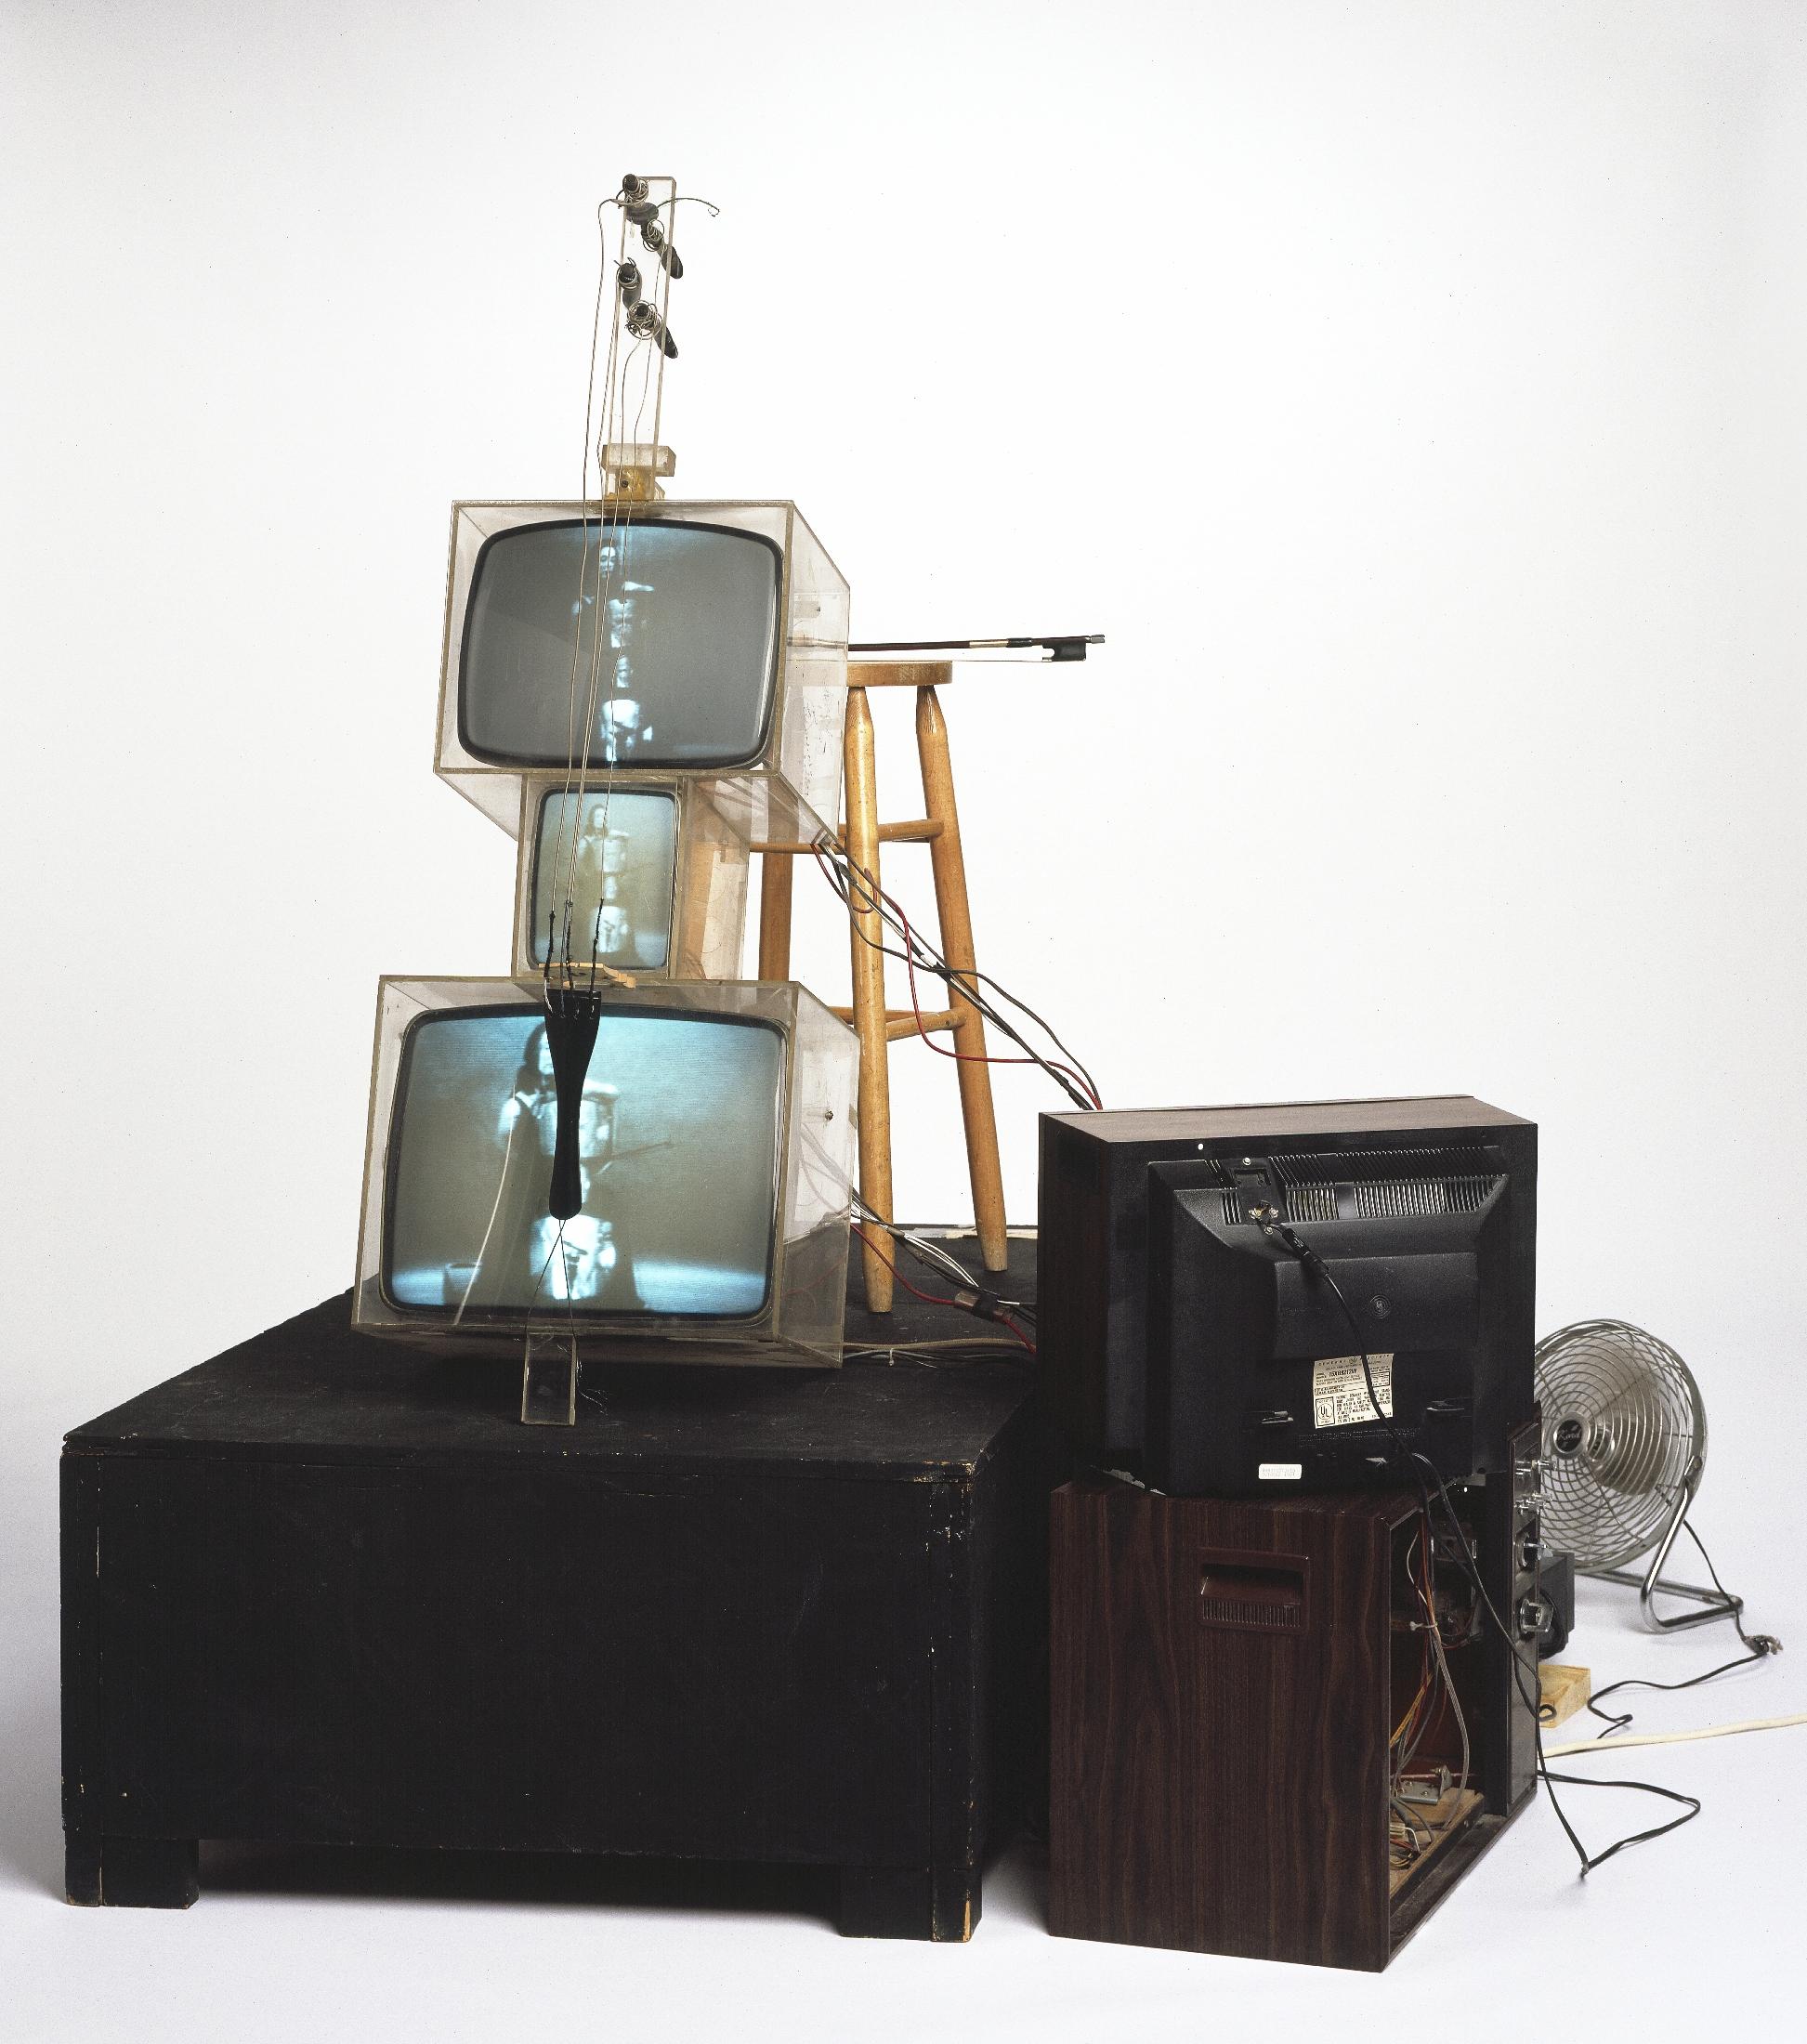 Nam June Paik, 'TV Cello' (1971), video tubes, TV chassis, plexiglass boxes, electronics, wiring, wood base, fan, stool, photograph. © Estate of Nam June Paik. Courtesy Walker Art Cente